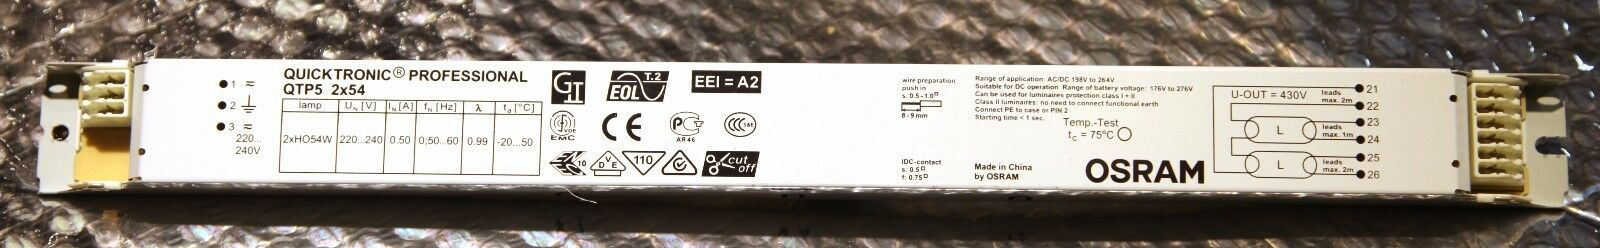 2 x Osram 1x36//230-240 Quicktronic Professional Vorschaltgerät Typ